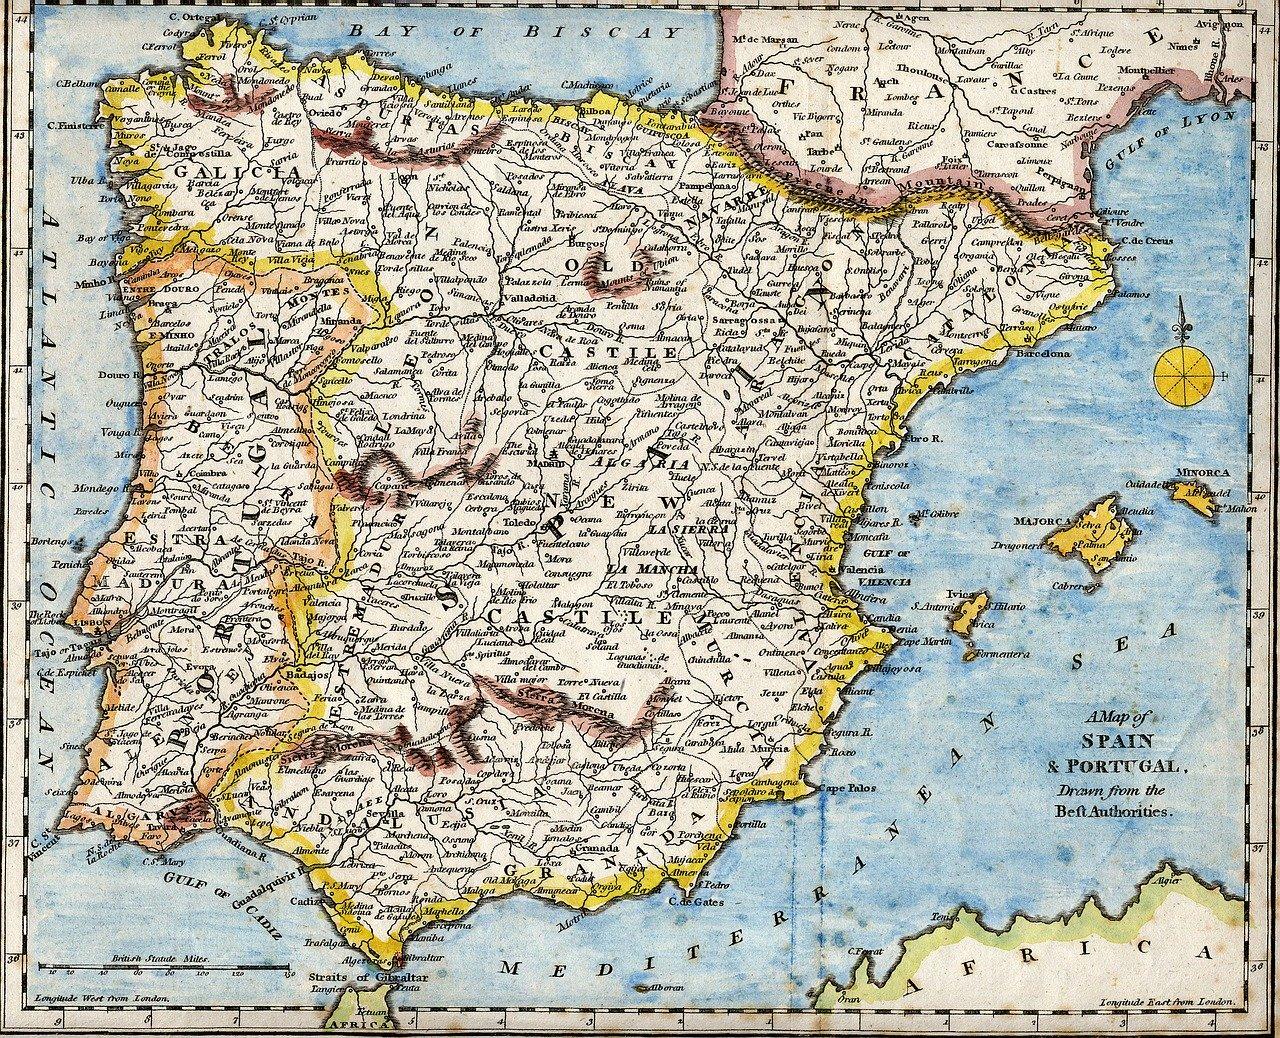 Spain Portugal Mediterranean  - WikiImages / Pixabay